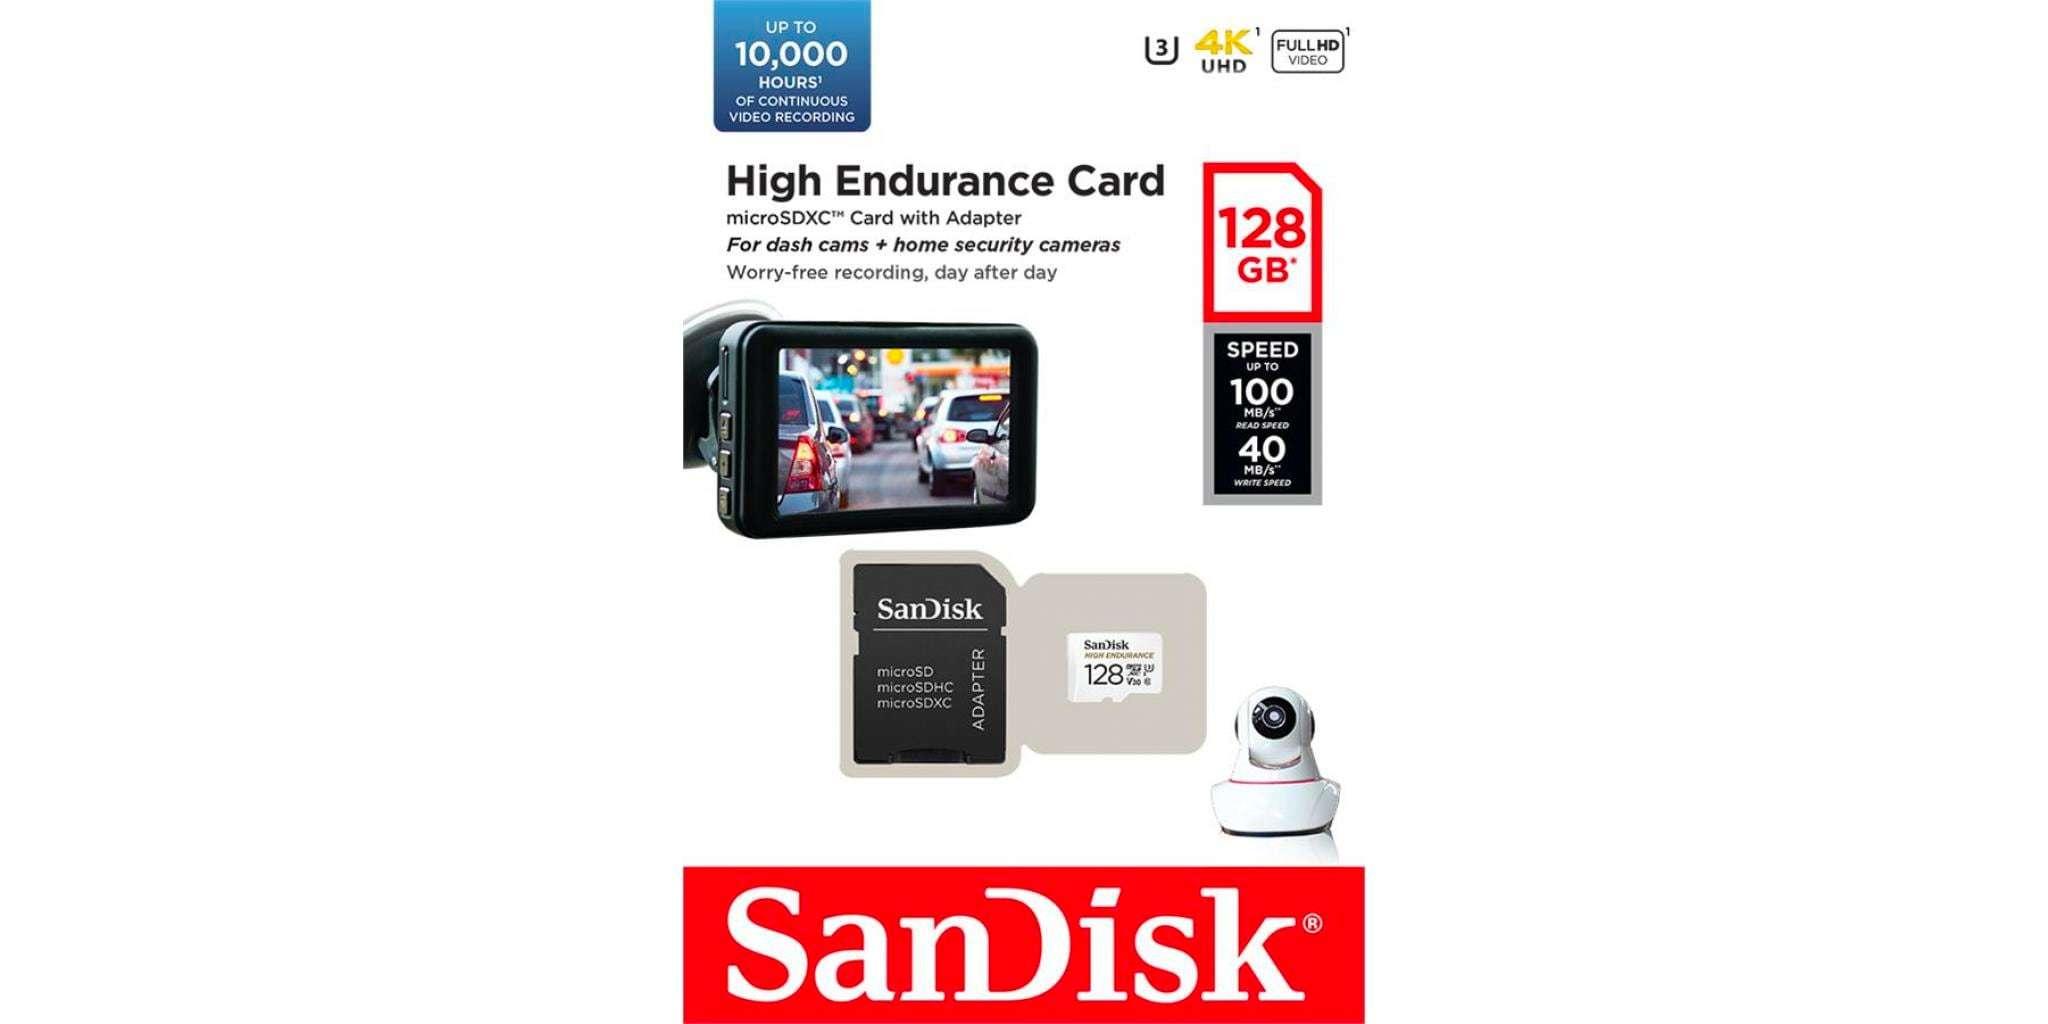 Карта памяти microSD 128GB SanDisk microSDXC Class 10 UHS-I U3 V30 High Endurance Video Monitoring Card